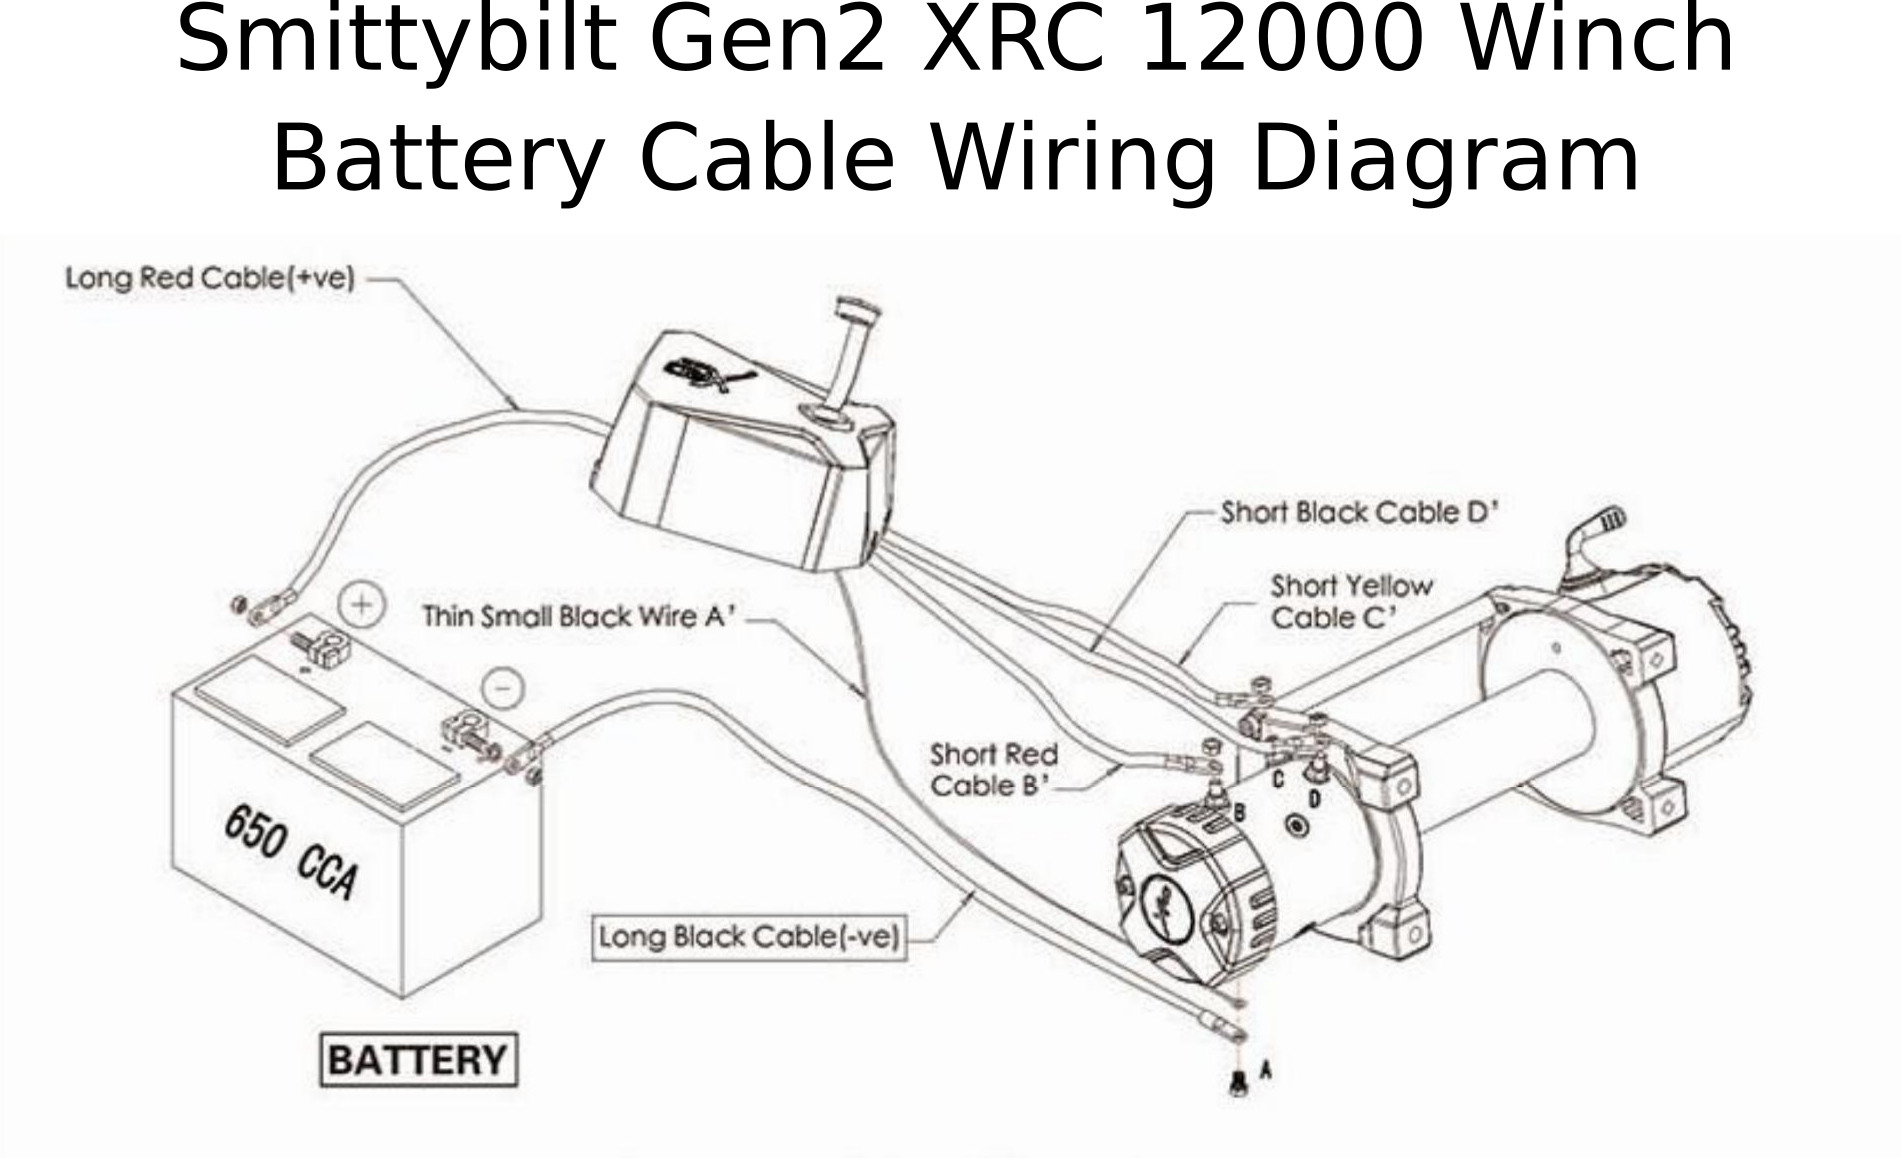 [DIAGRAM] Warn 12000 Winch Wiring Diagram FULL Version HD